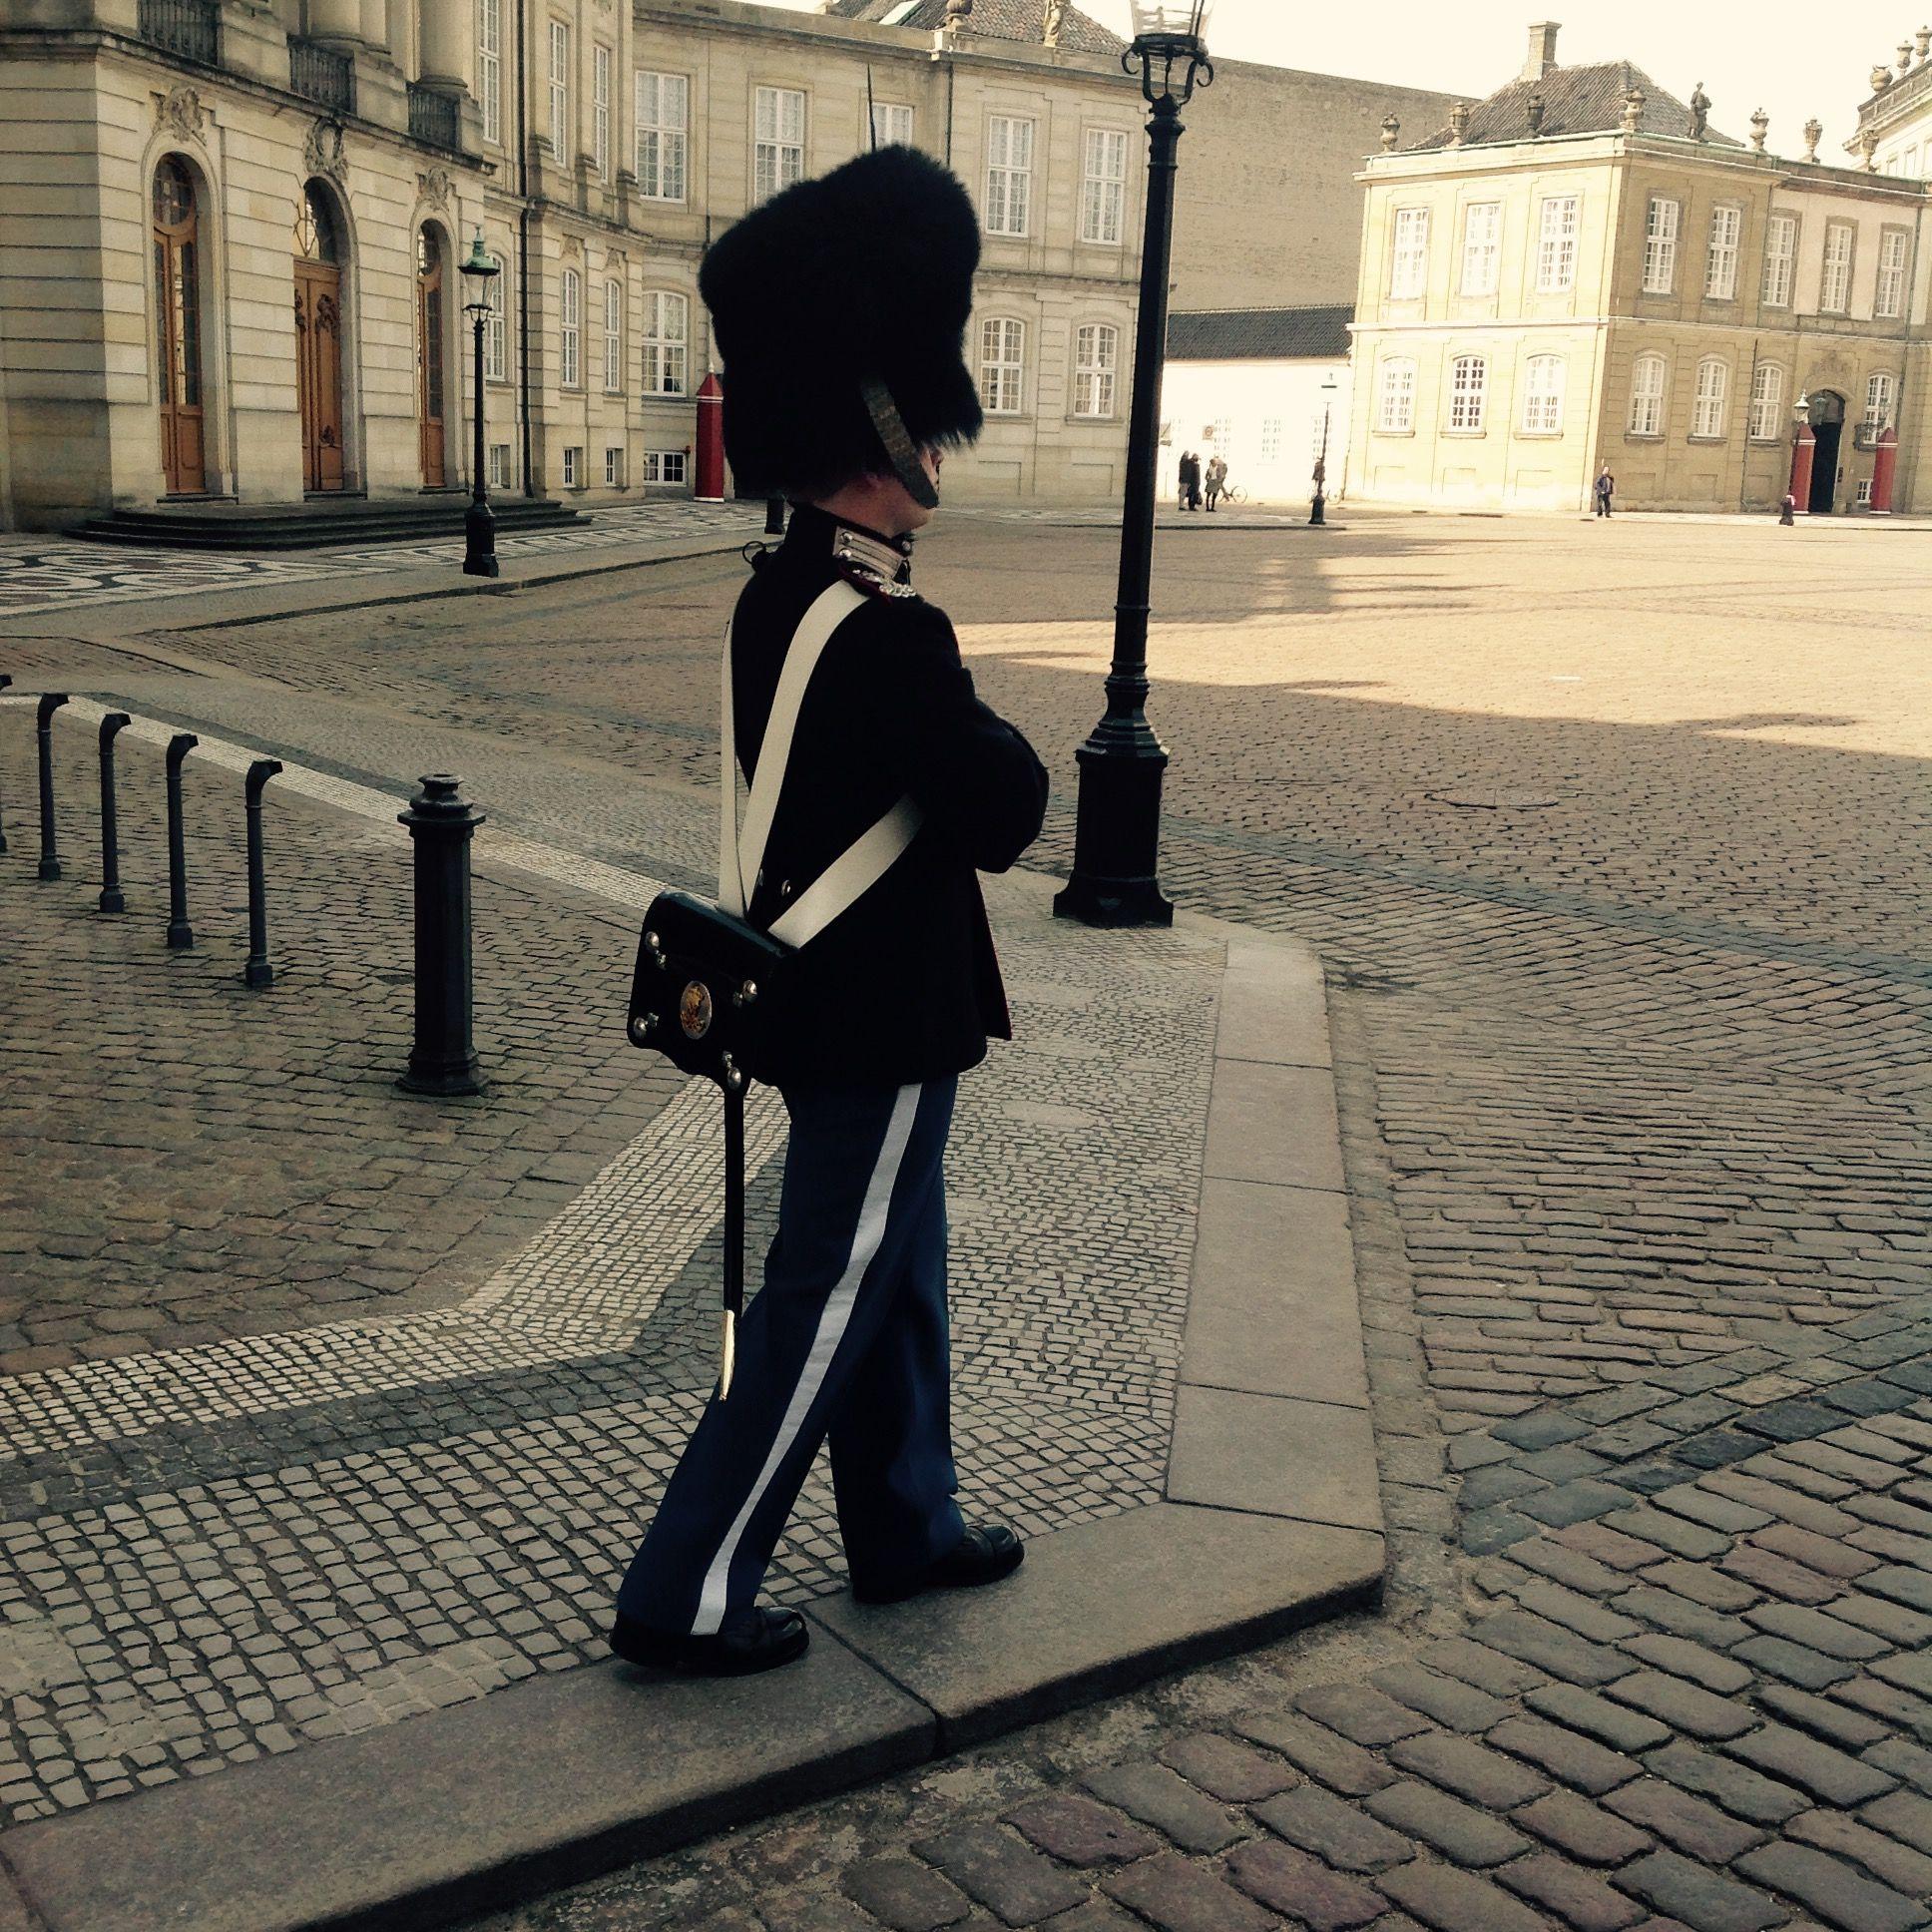 Royal Life Guard. Copenhagen, Denmark.